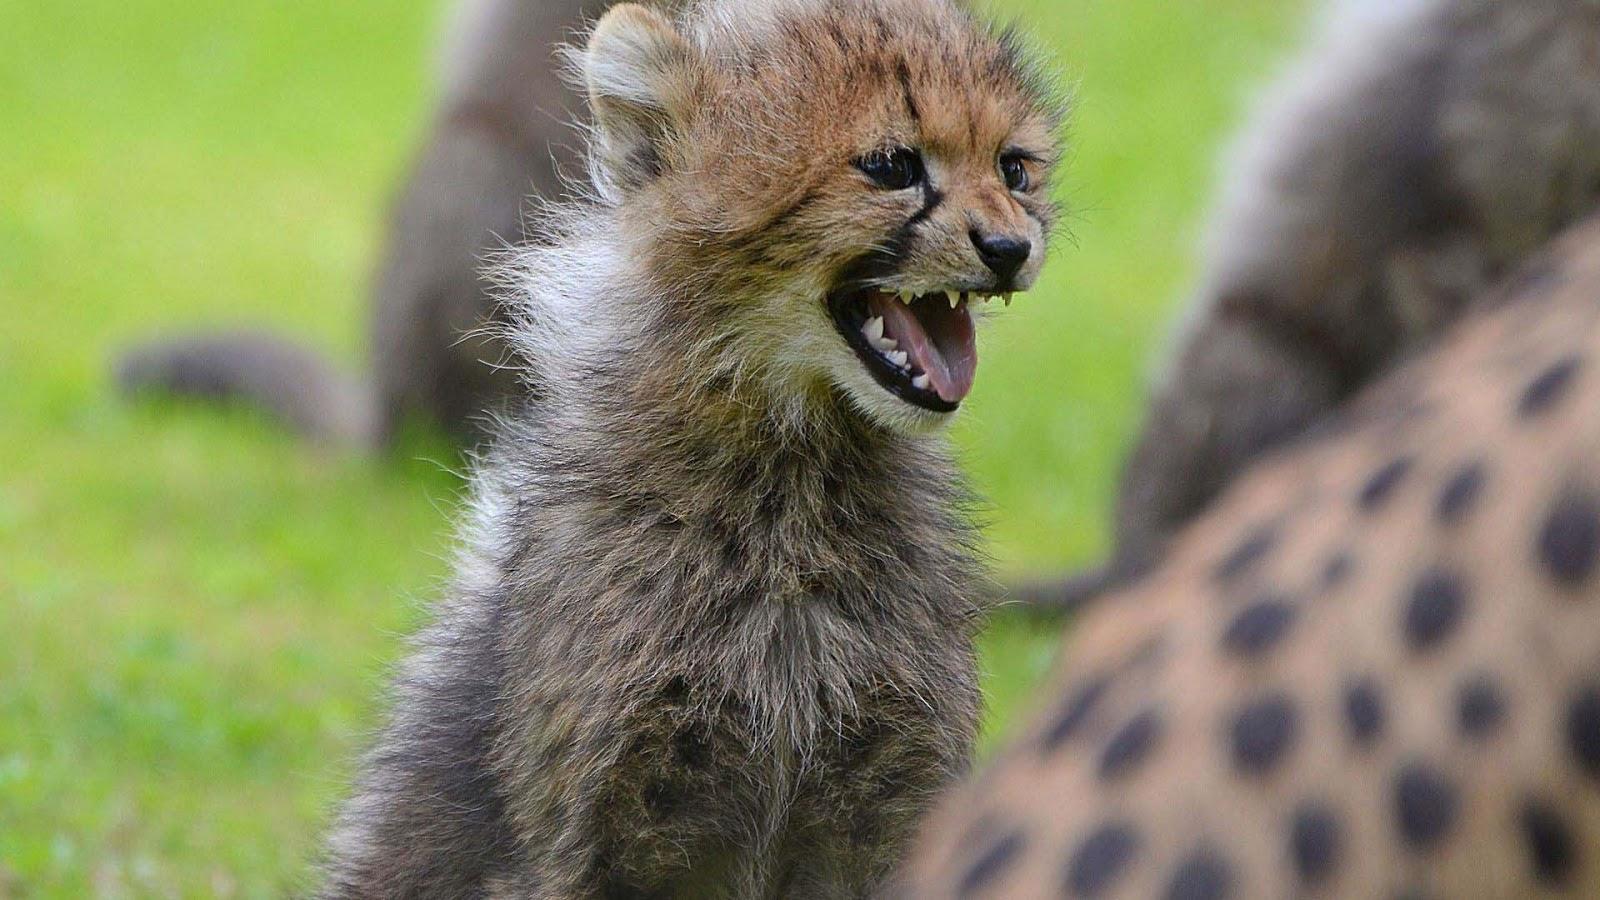 Cute Baby Cheetah Cubs Wallpaper Tiger Wallpapers Allfreshwallpaper